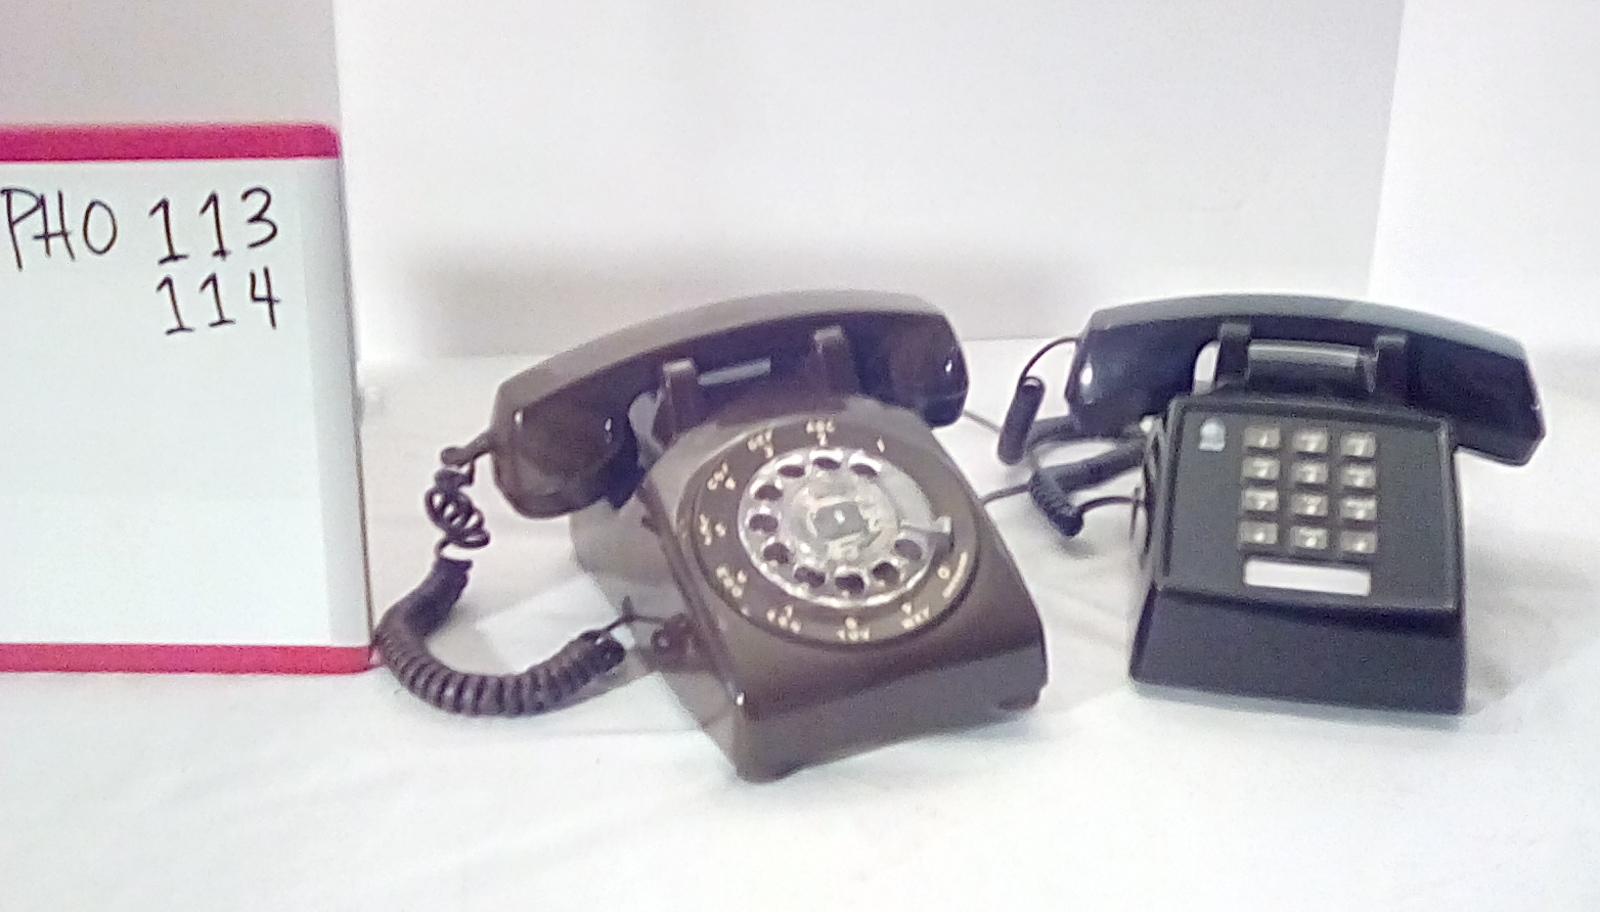 PHO113 Brown rotary desk phone, PHO114 Black push button desk phone